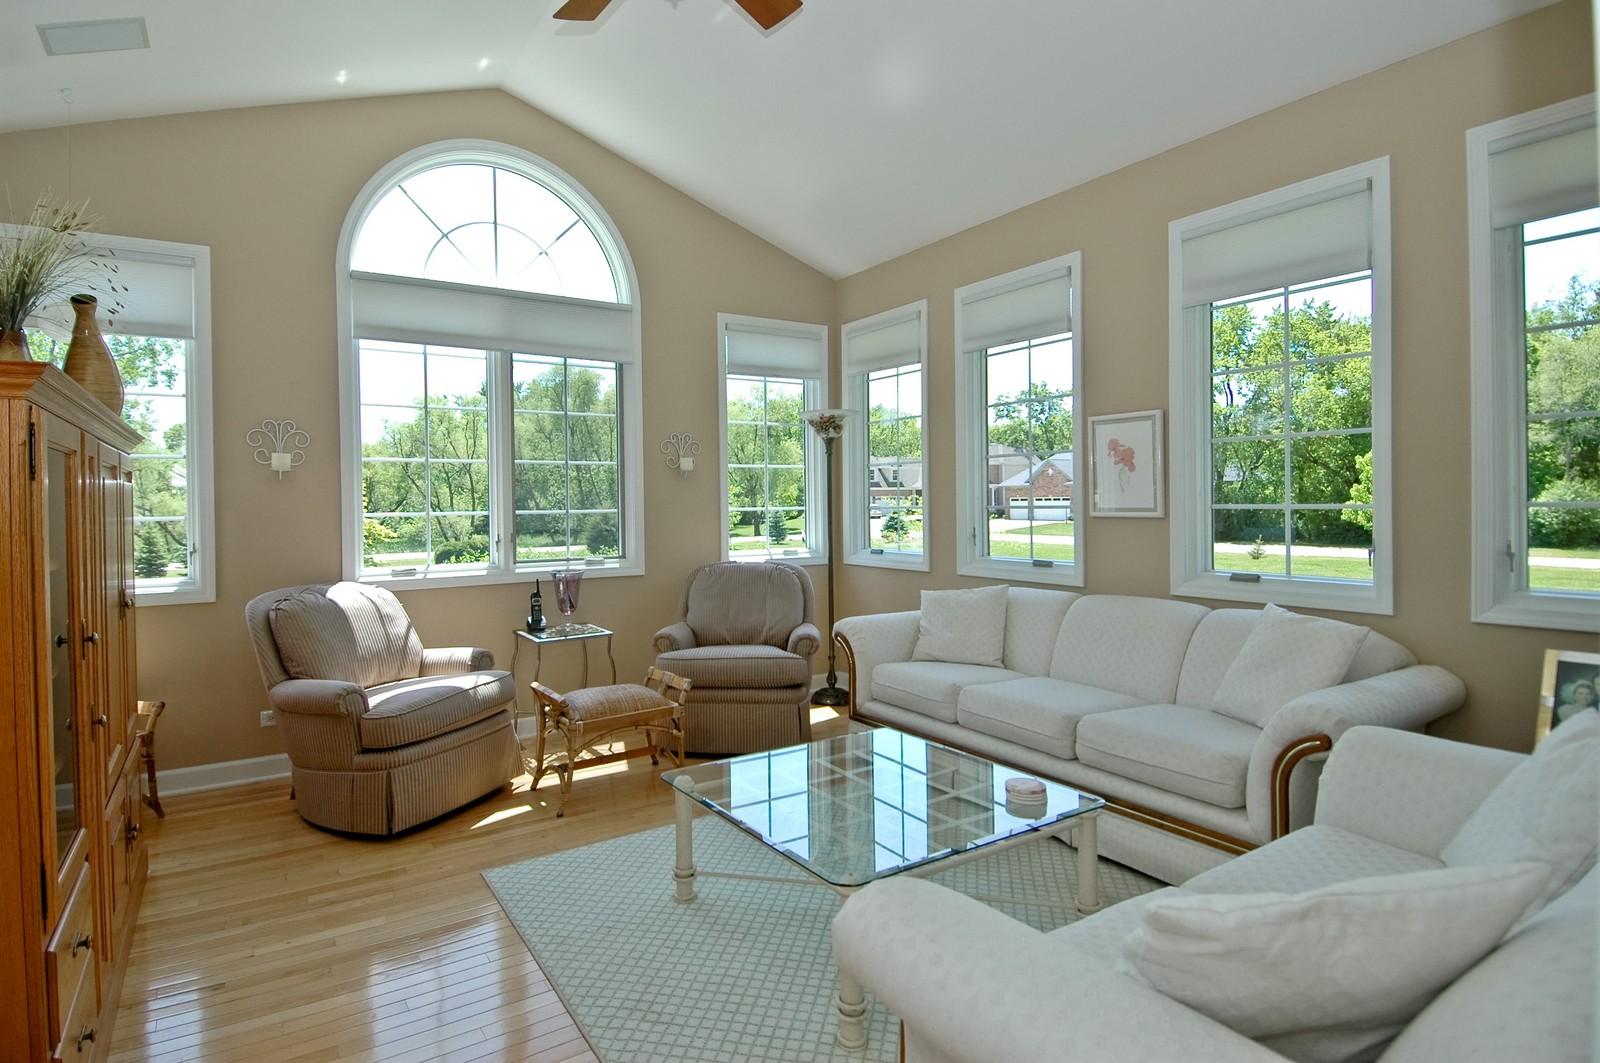 Real Estate Photography - 8719 Shade Tree Circle, Village of Lakewood, IL, 60014 - Sun Room